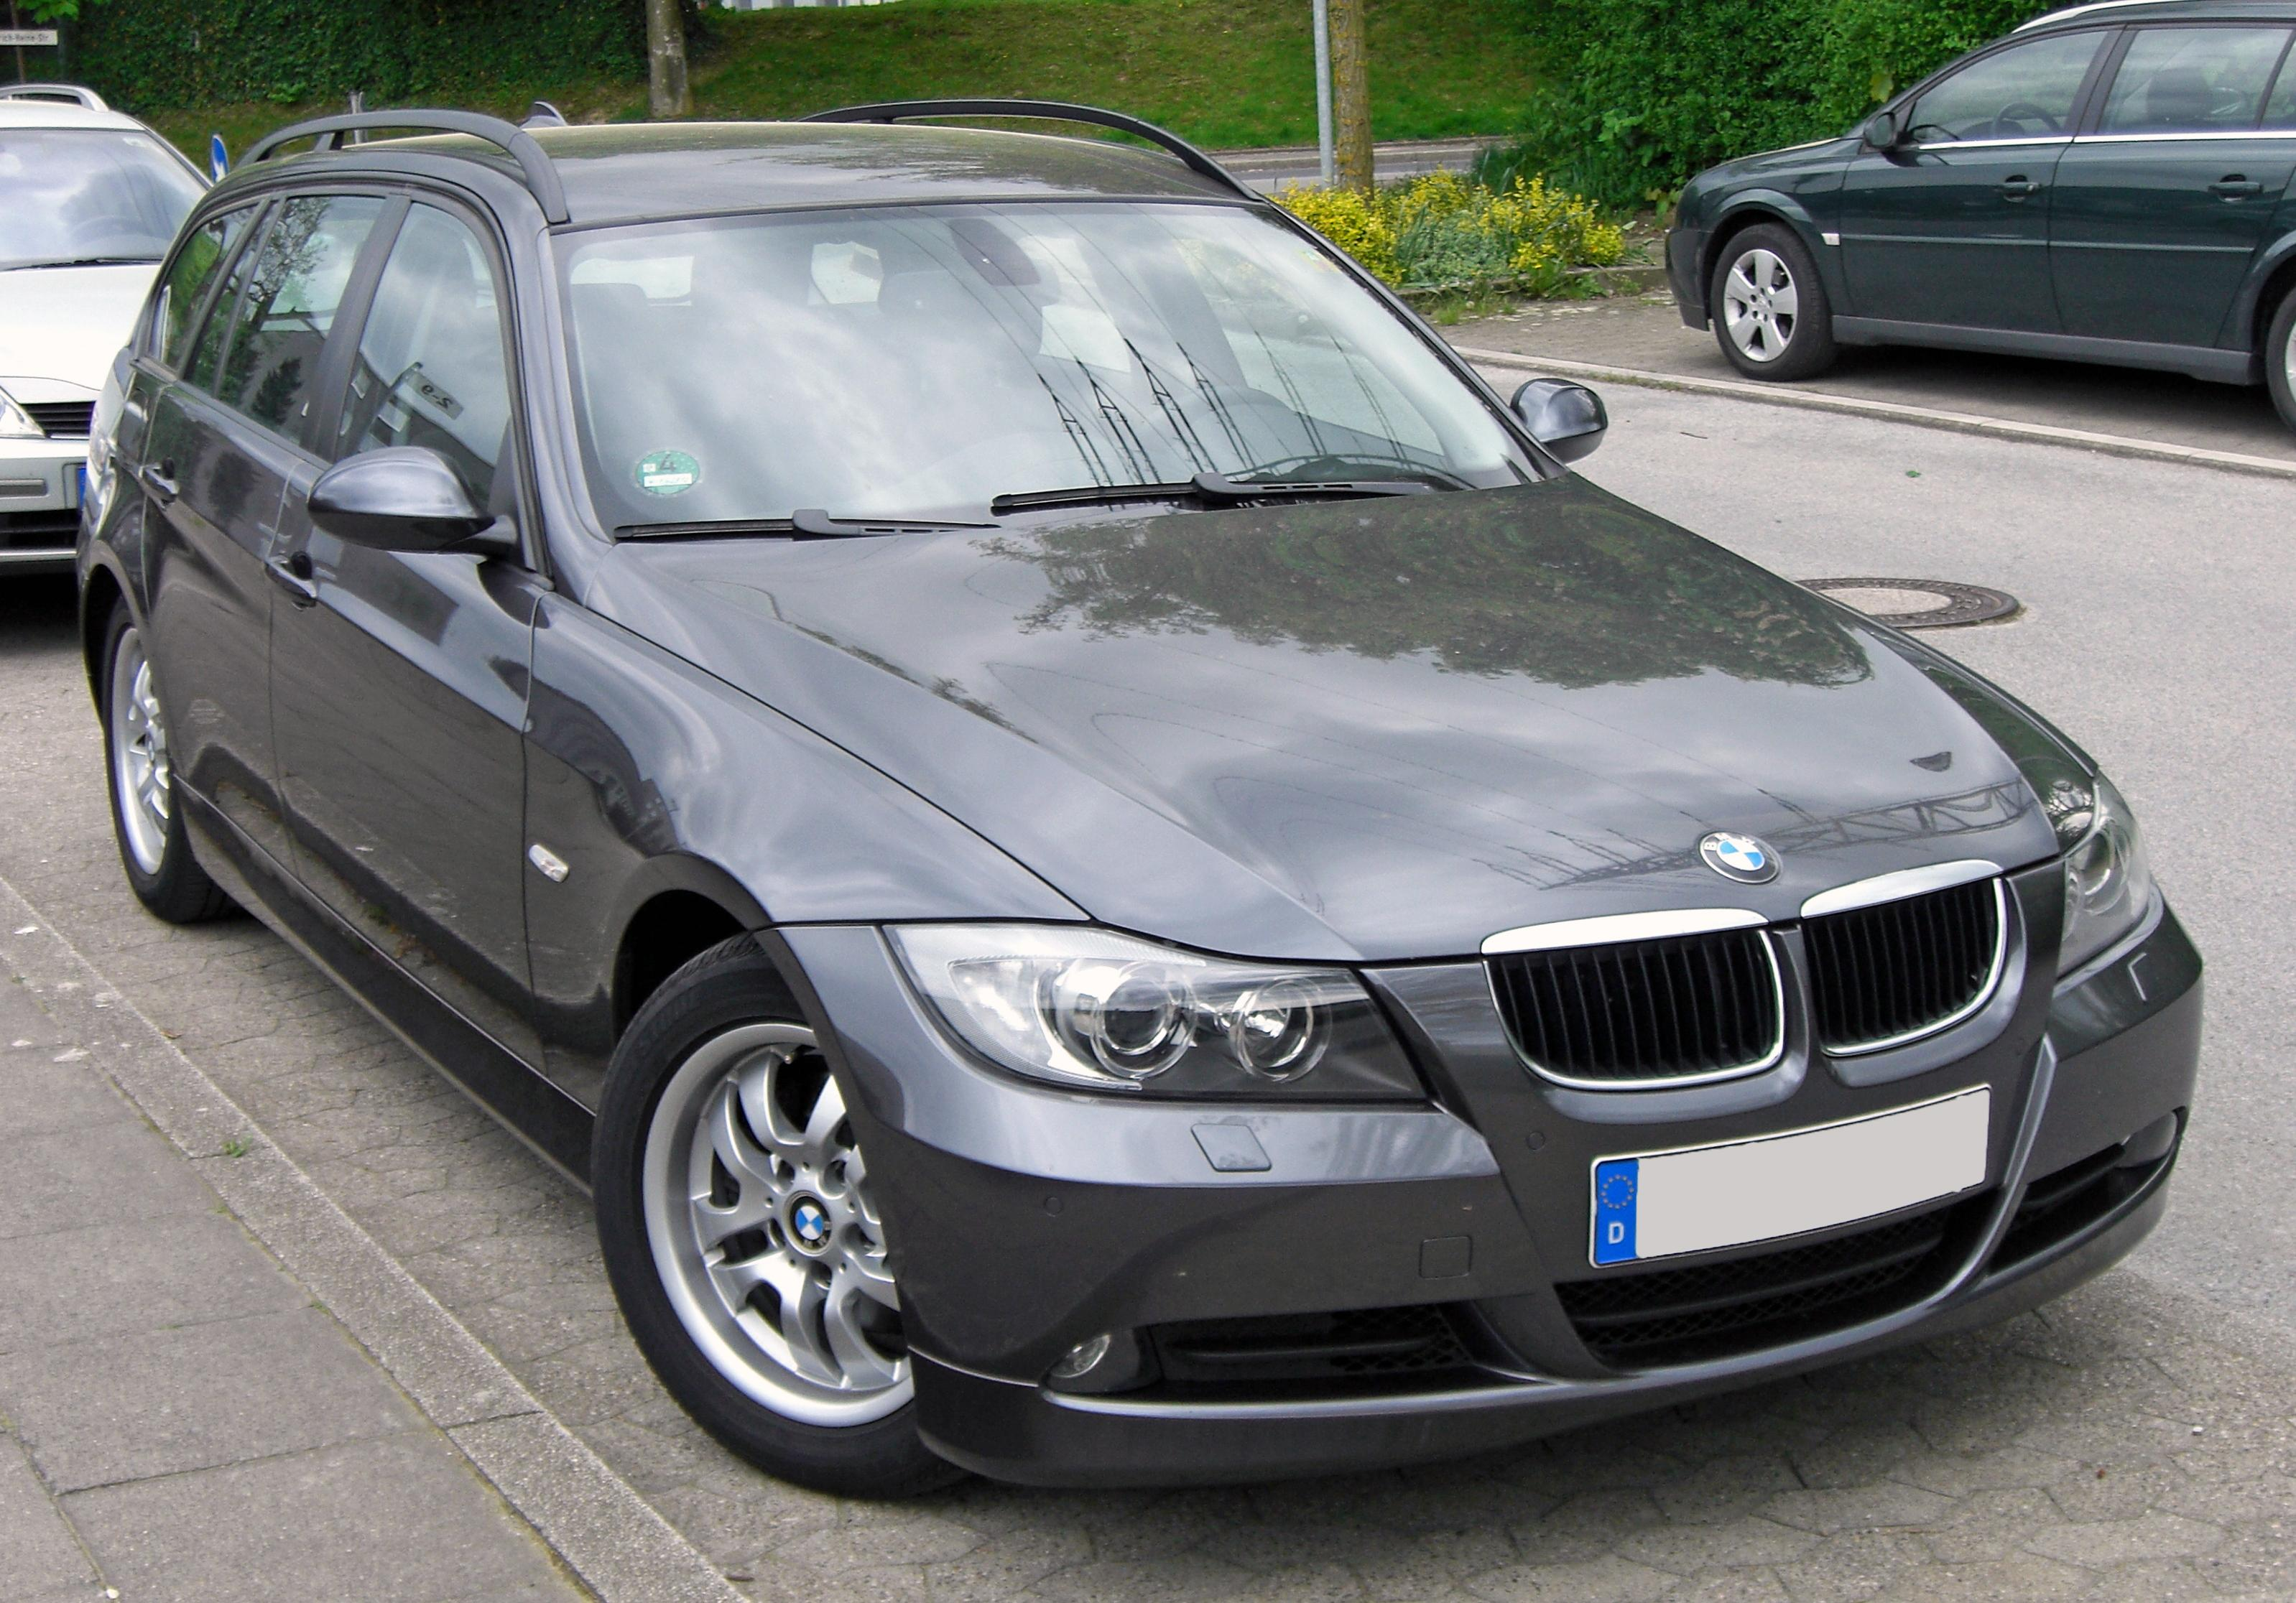 Bmw E90 Wiki >> File:BMW 3er Touring E91 20090425 front.JPG - Wikimedia Commons